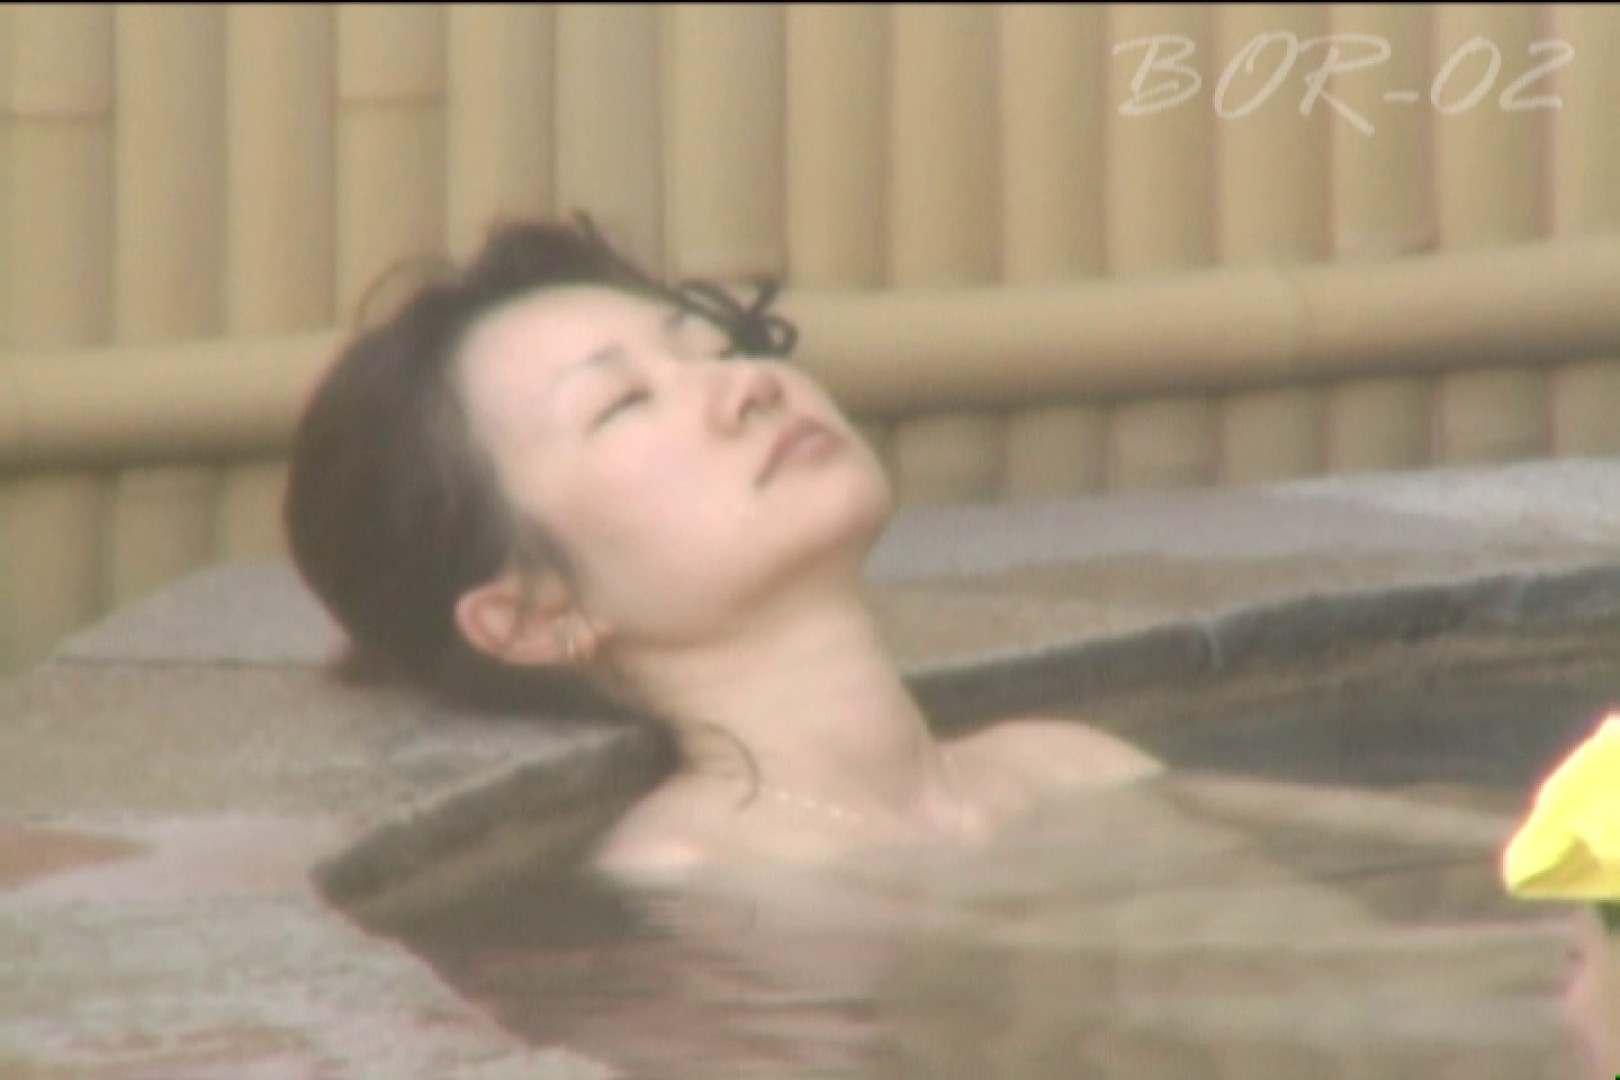 Aquaな露天風呂Vol.477 露天 アダルト動画キャプチャ 99PICs 41